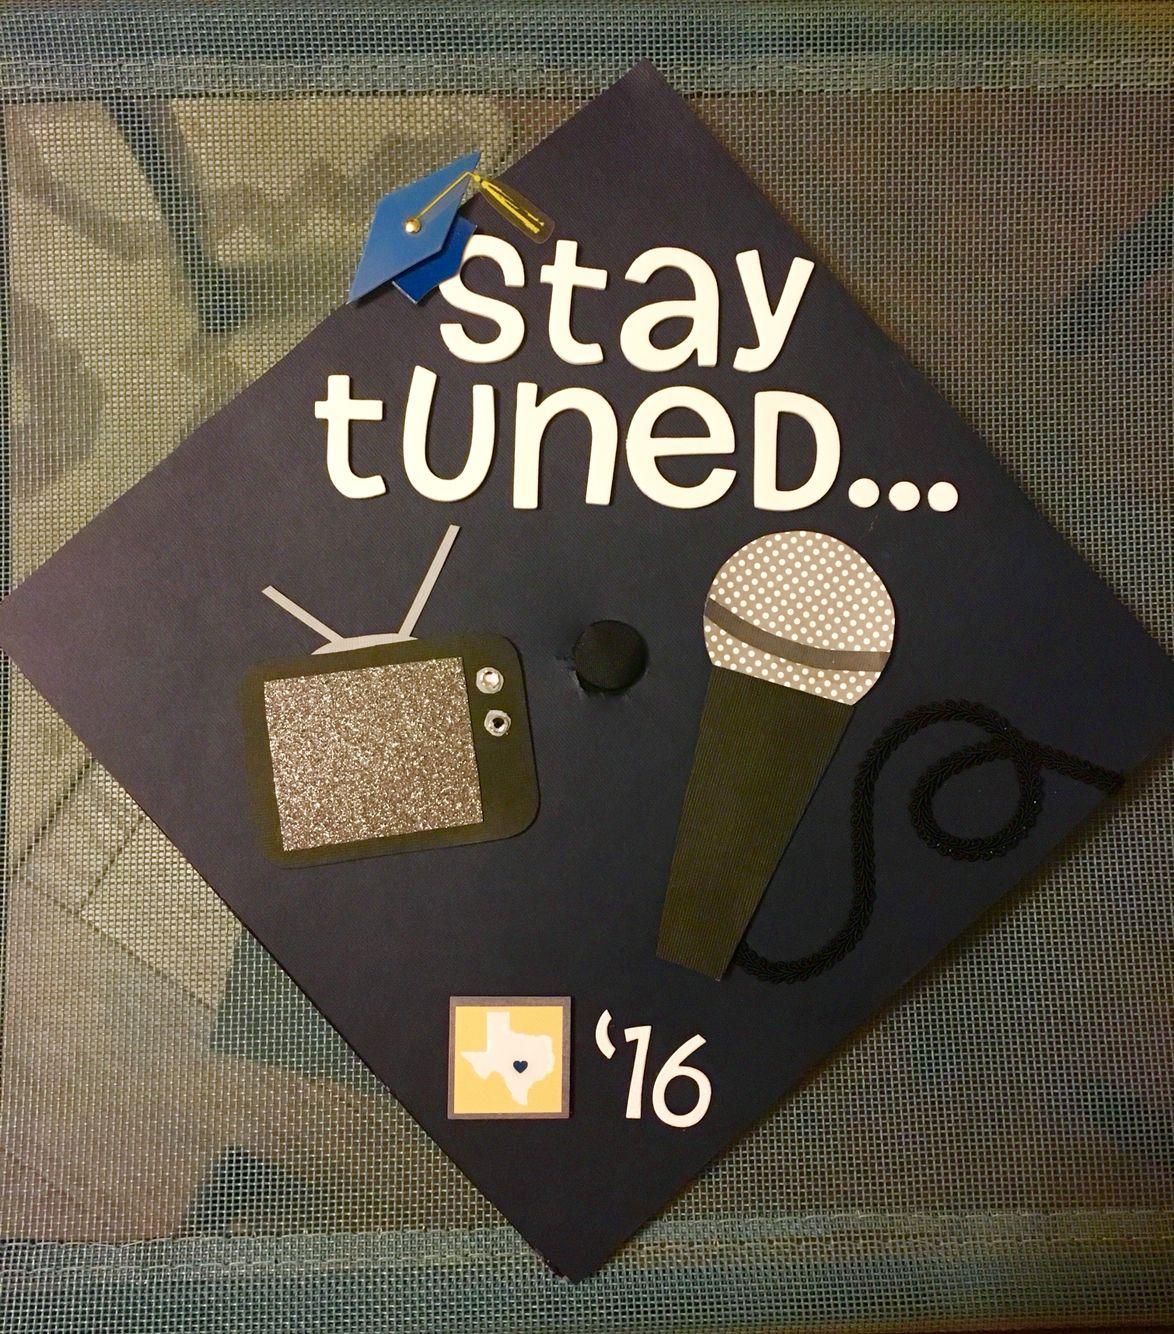 My Graduation Cap Journalism Major Future Reporter